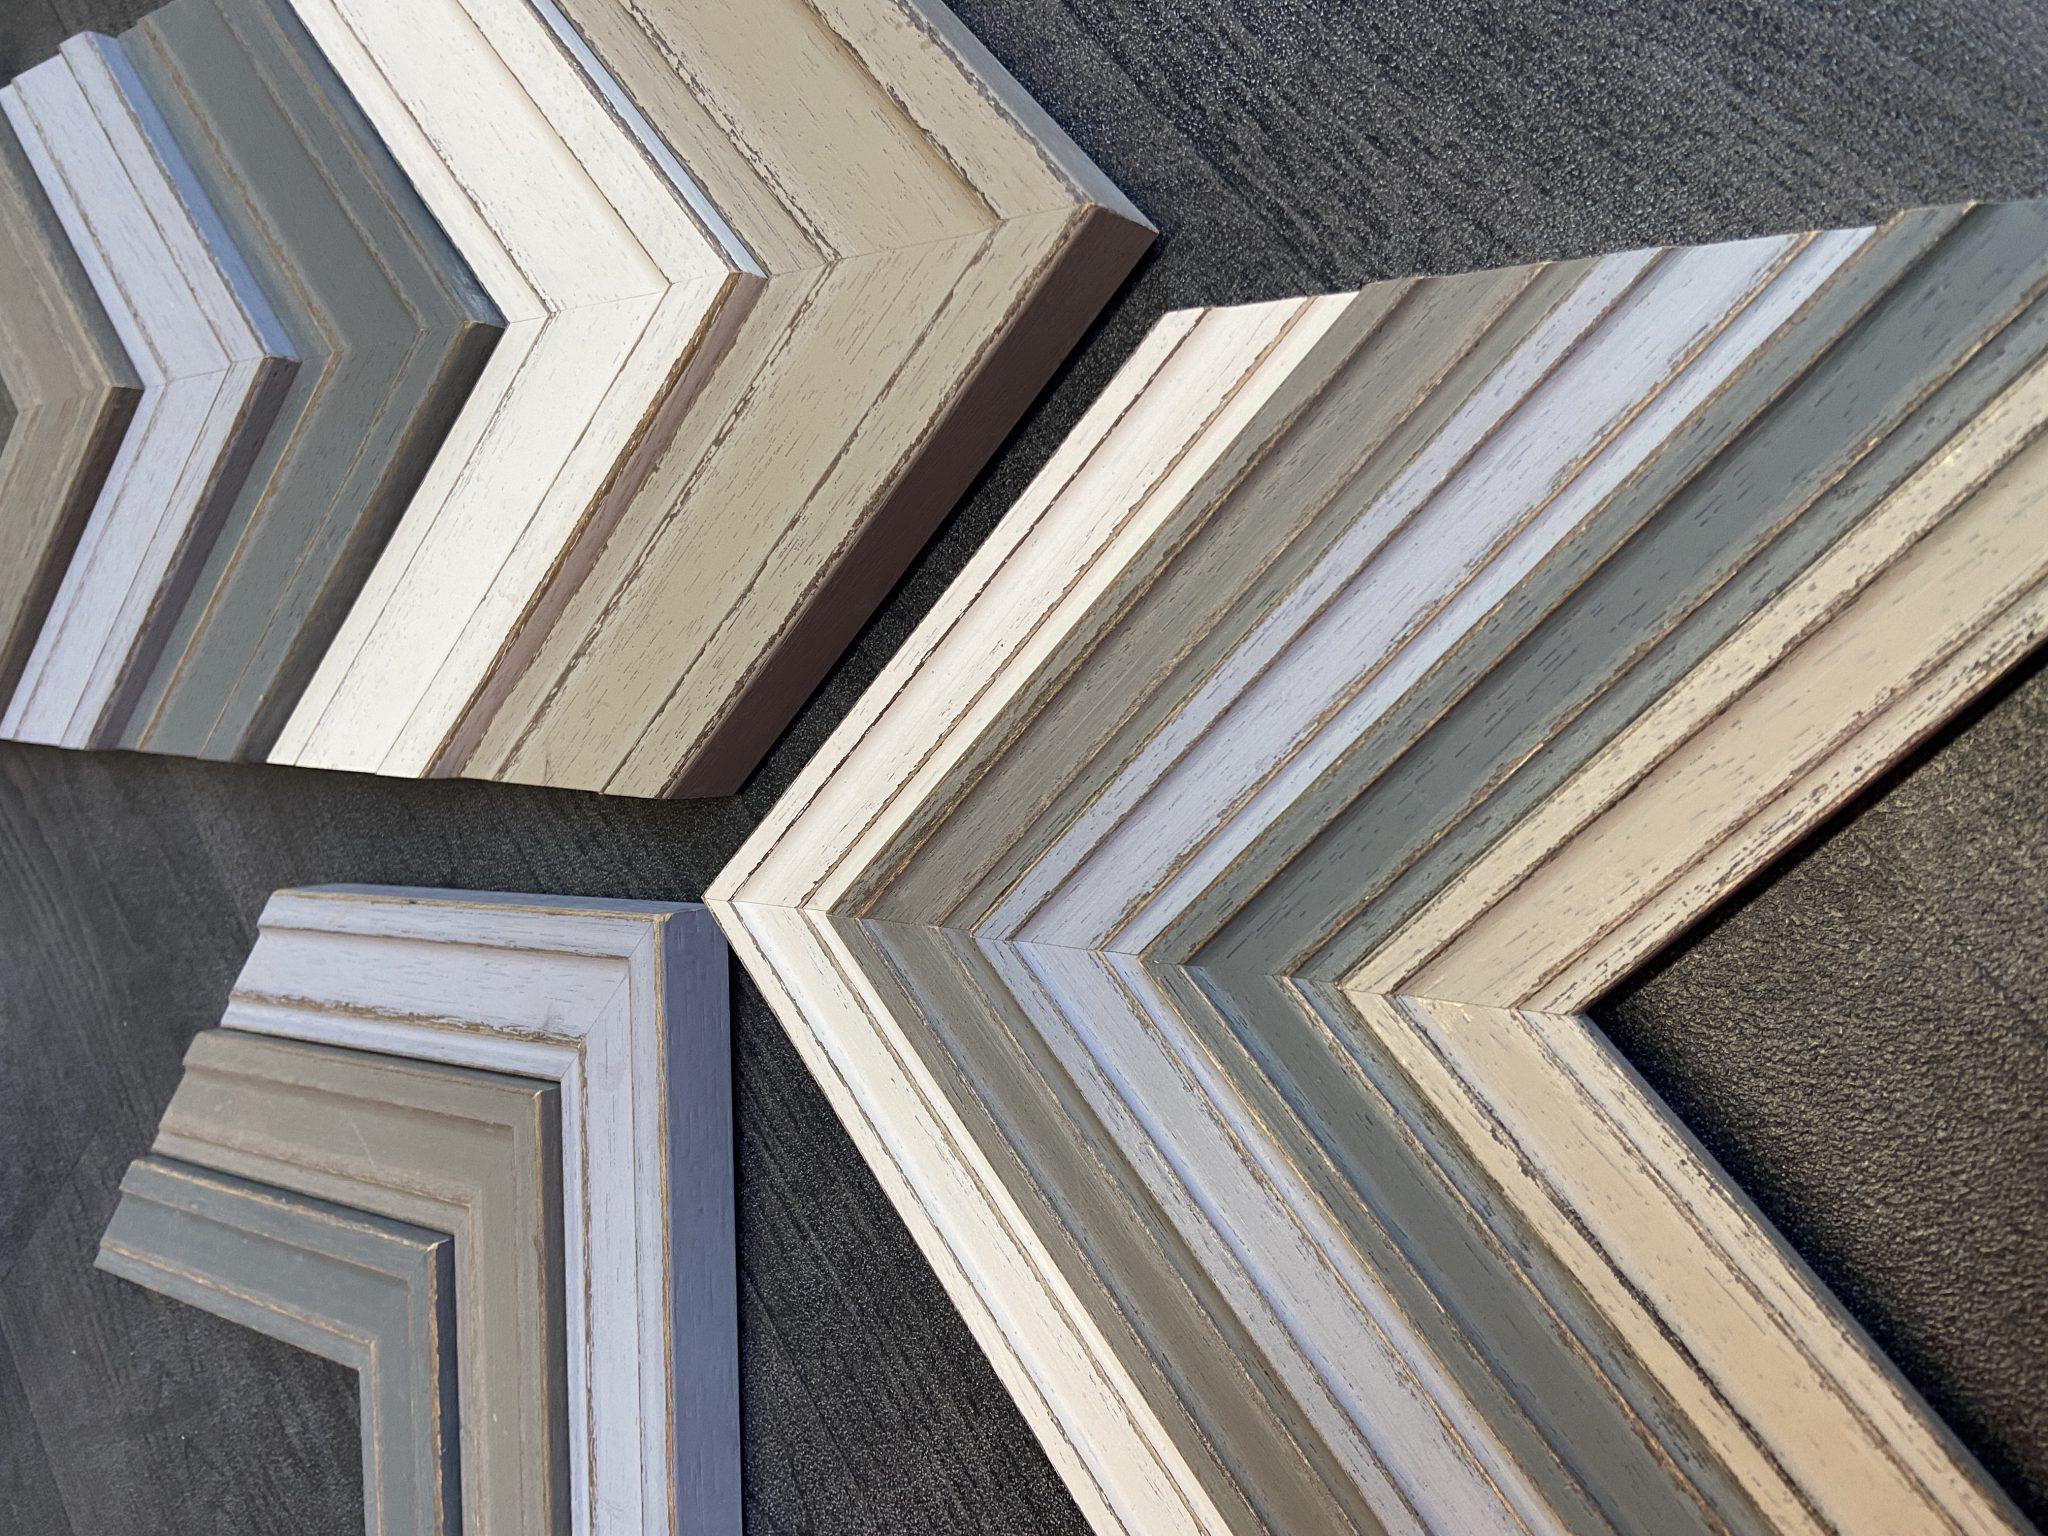 Southsea-moulding-available-at-ironbridge-fine-arts